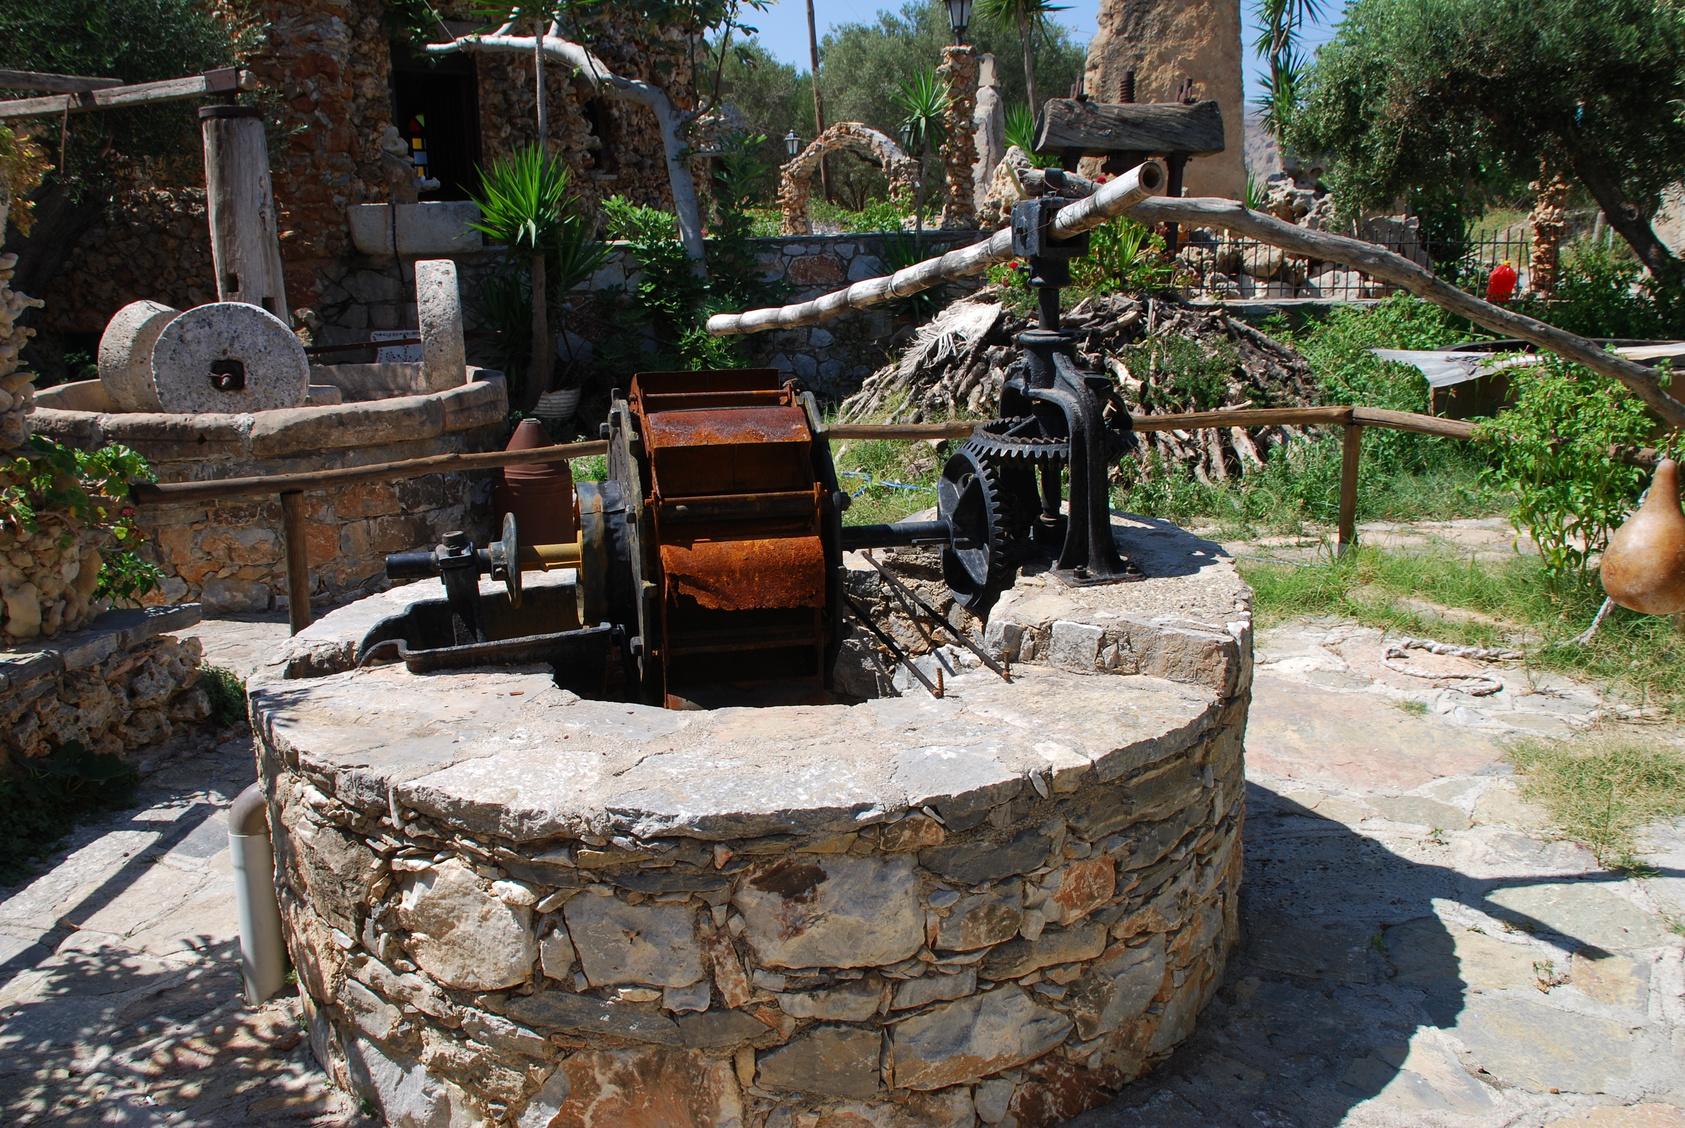 The King Of The Cretan Diet: Cretan Olive Oil